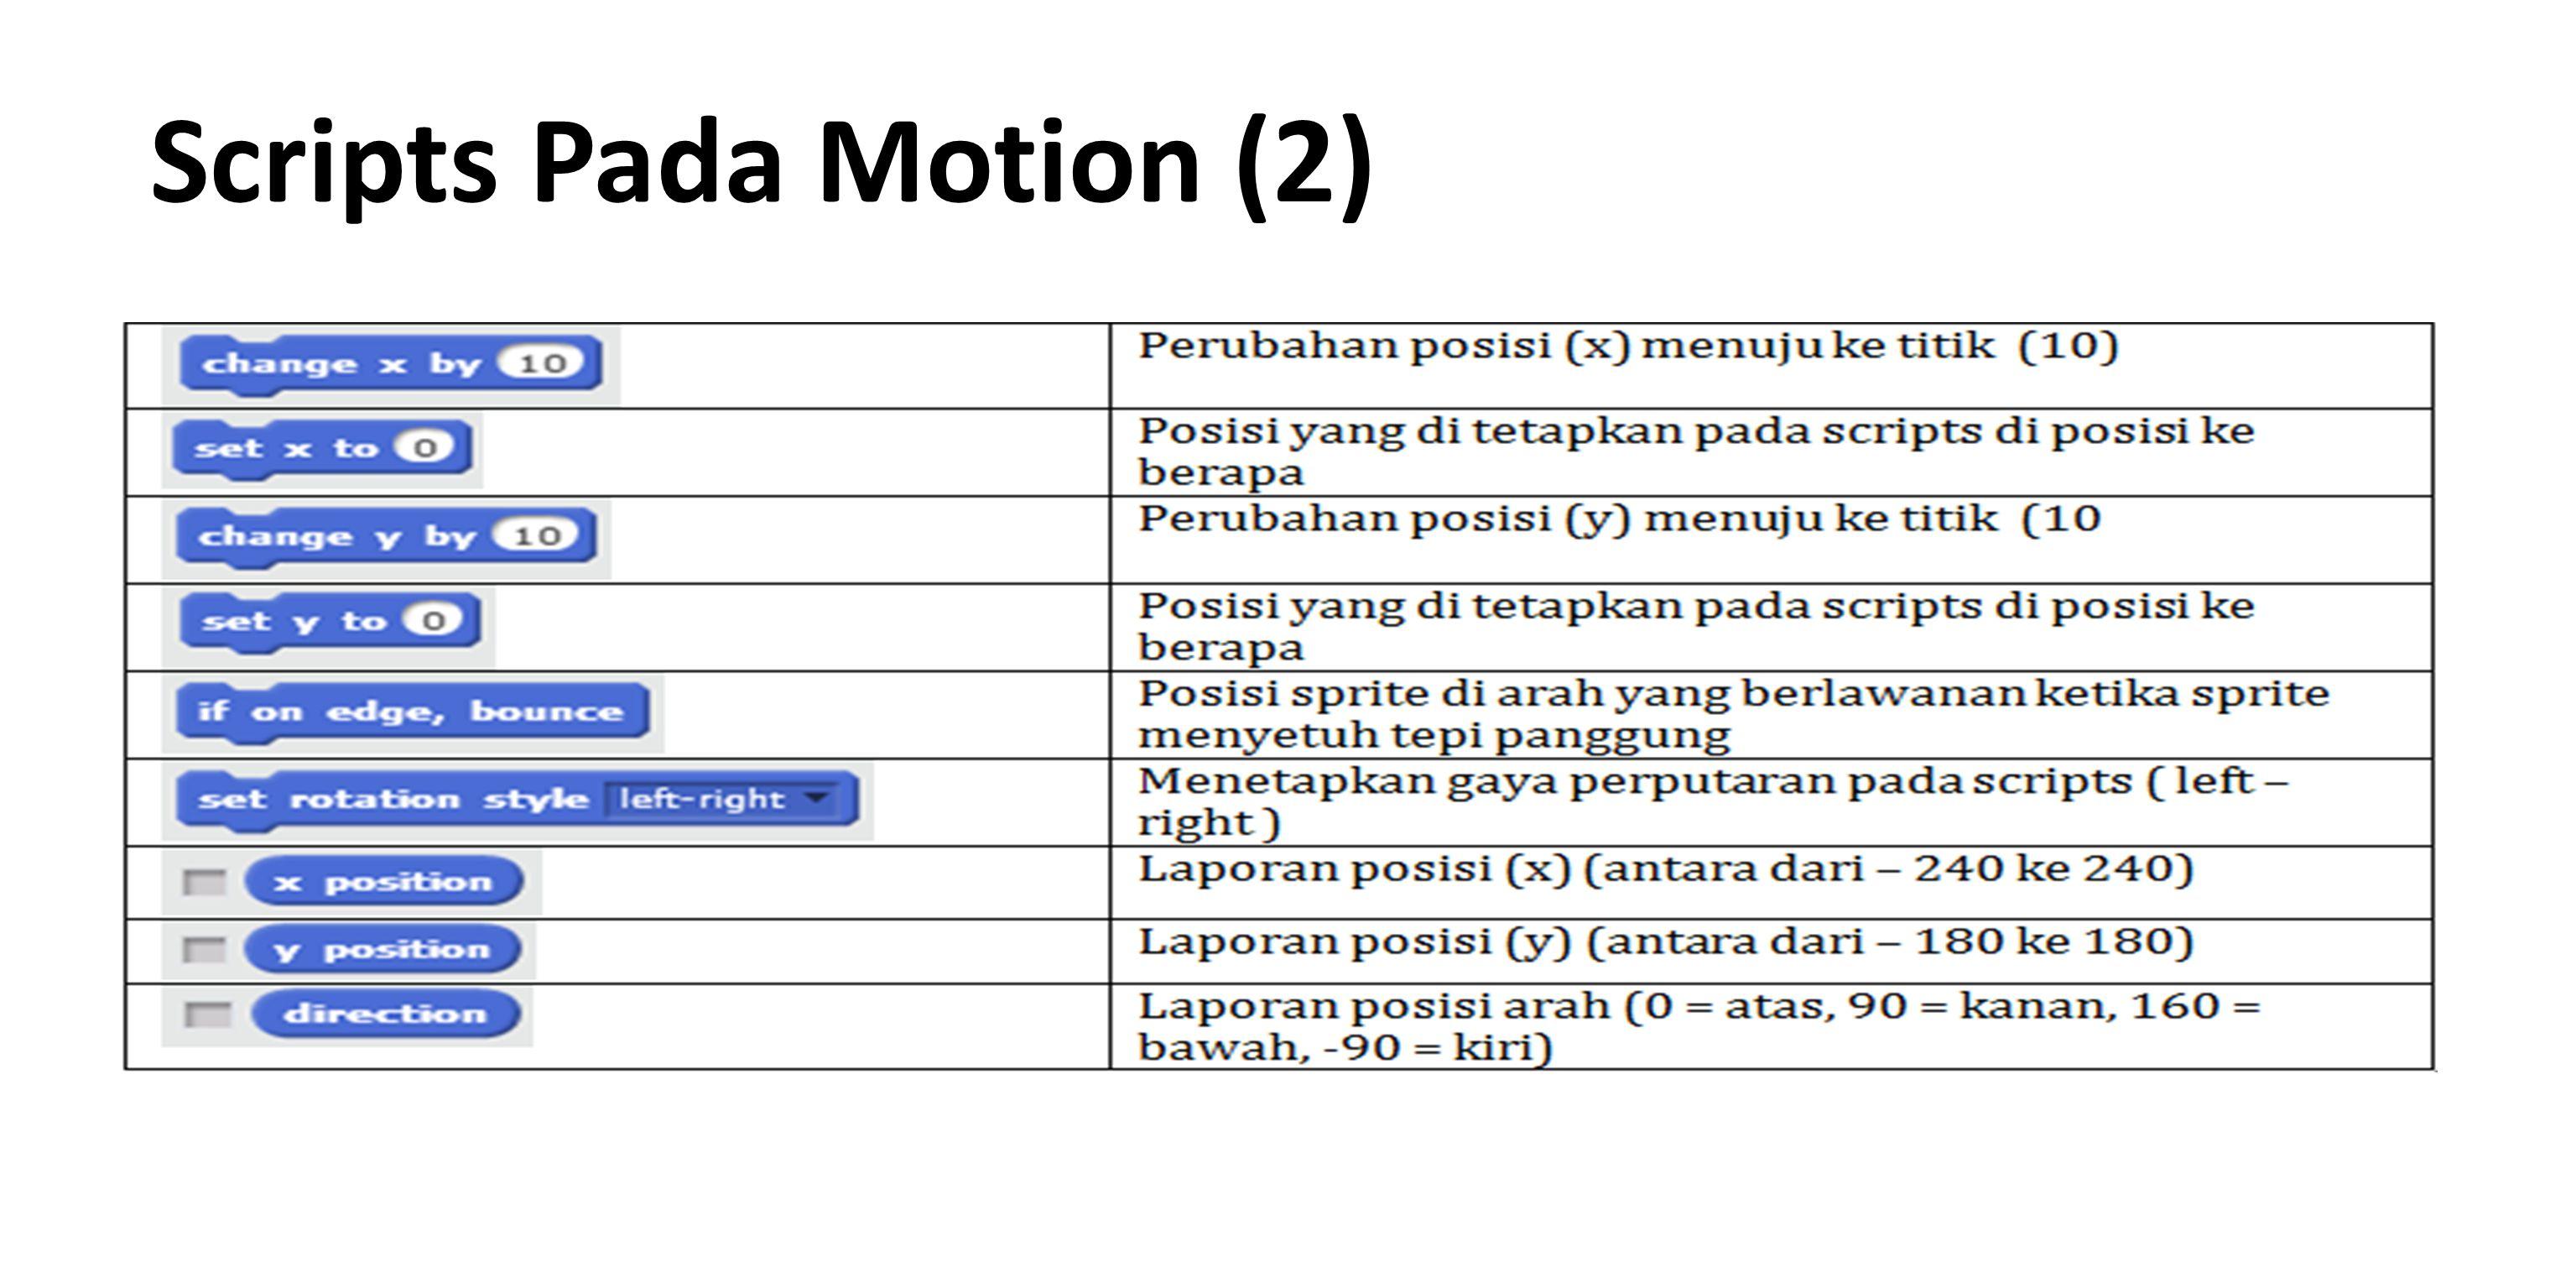 Scripts Pada Motion (2)